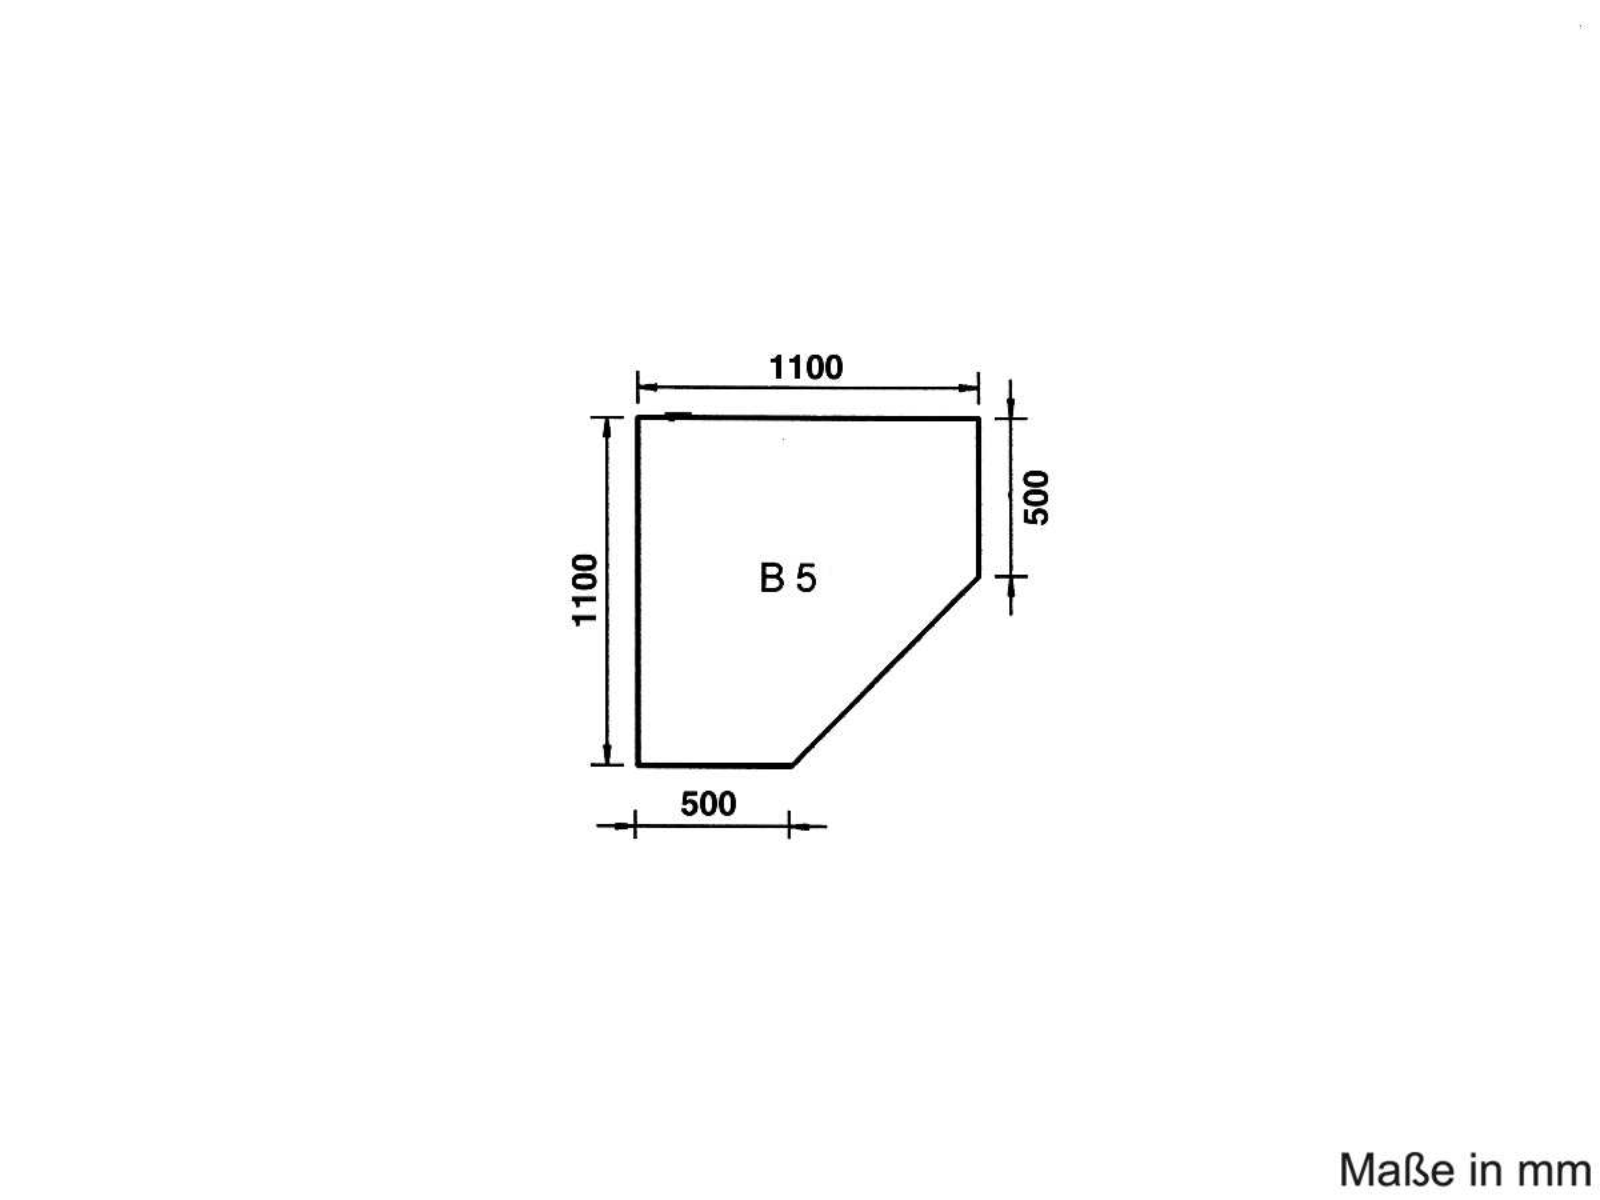 Justus Unterlegplatte Glas B5 Eckmodell 9201 64